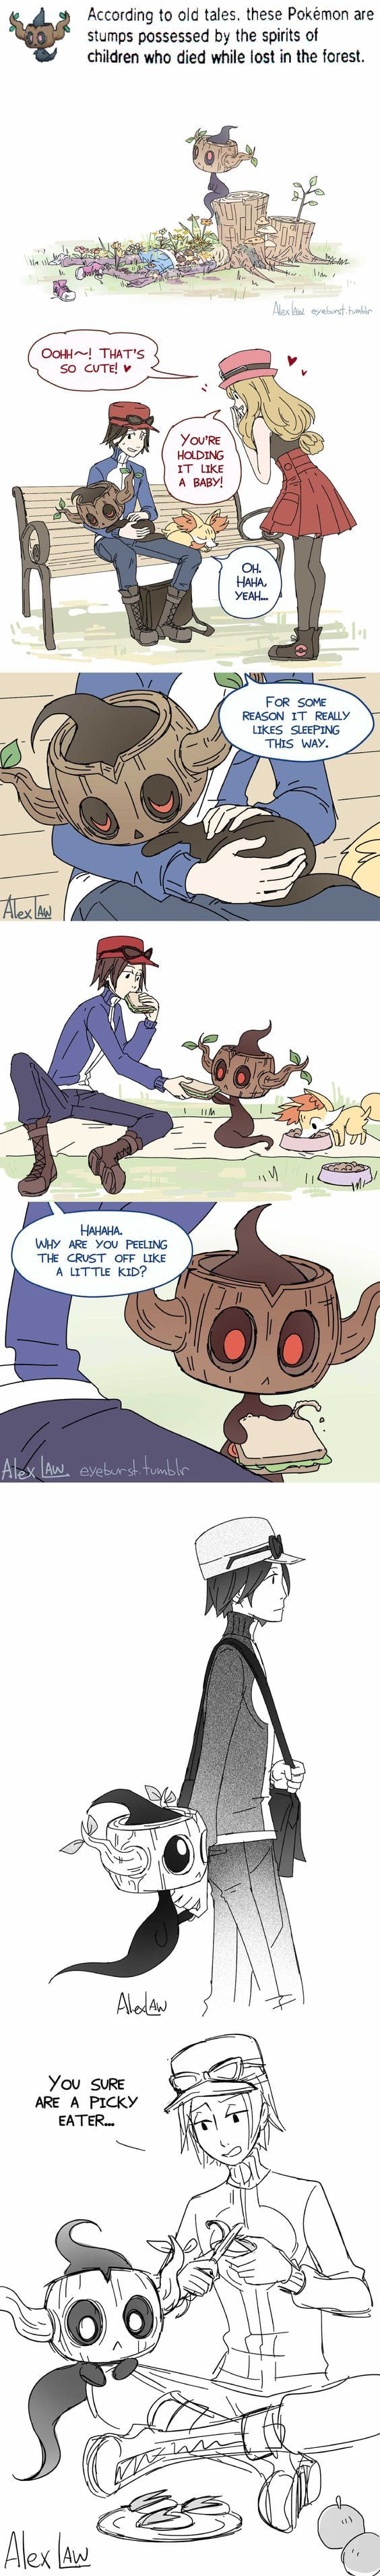 The fk Pokemon?? Some deep dark shit